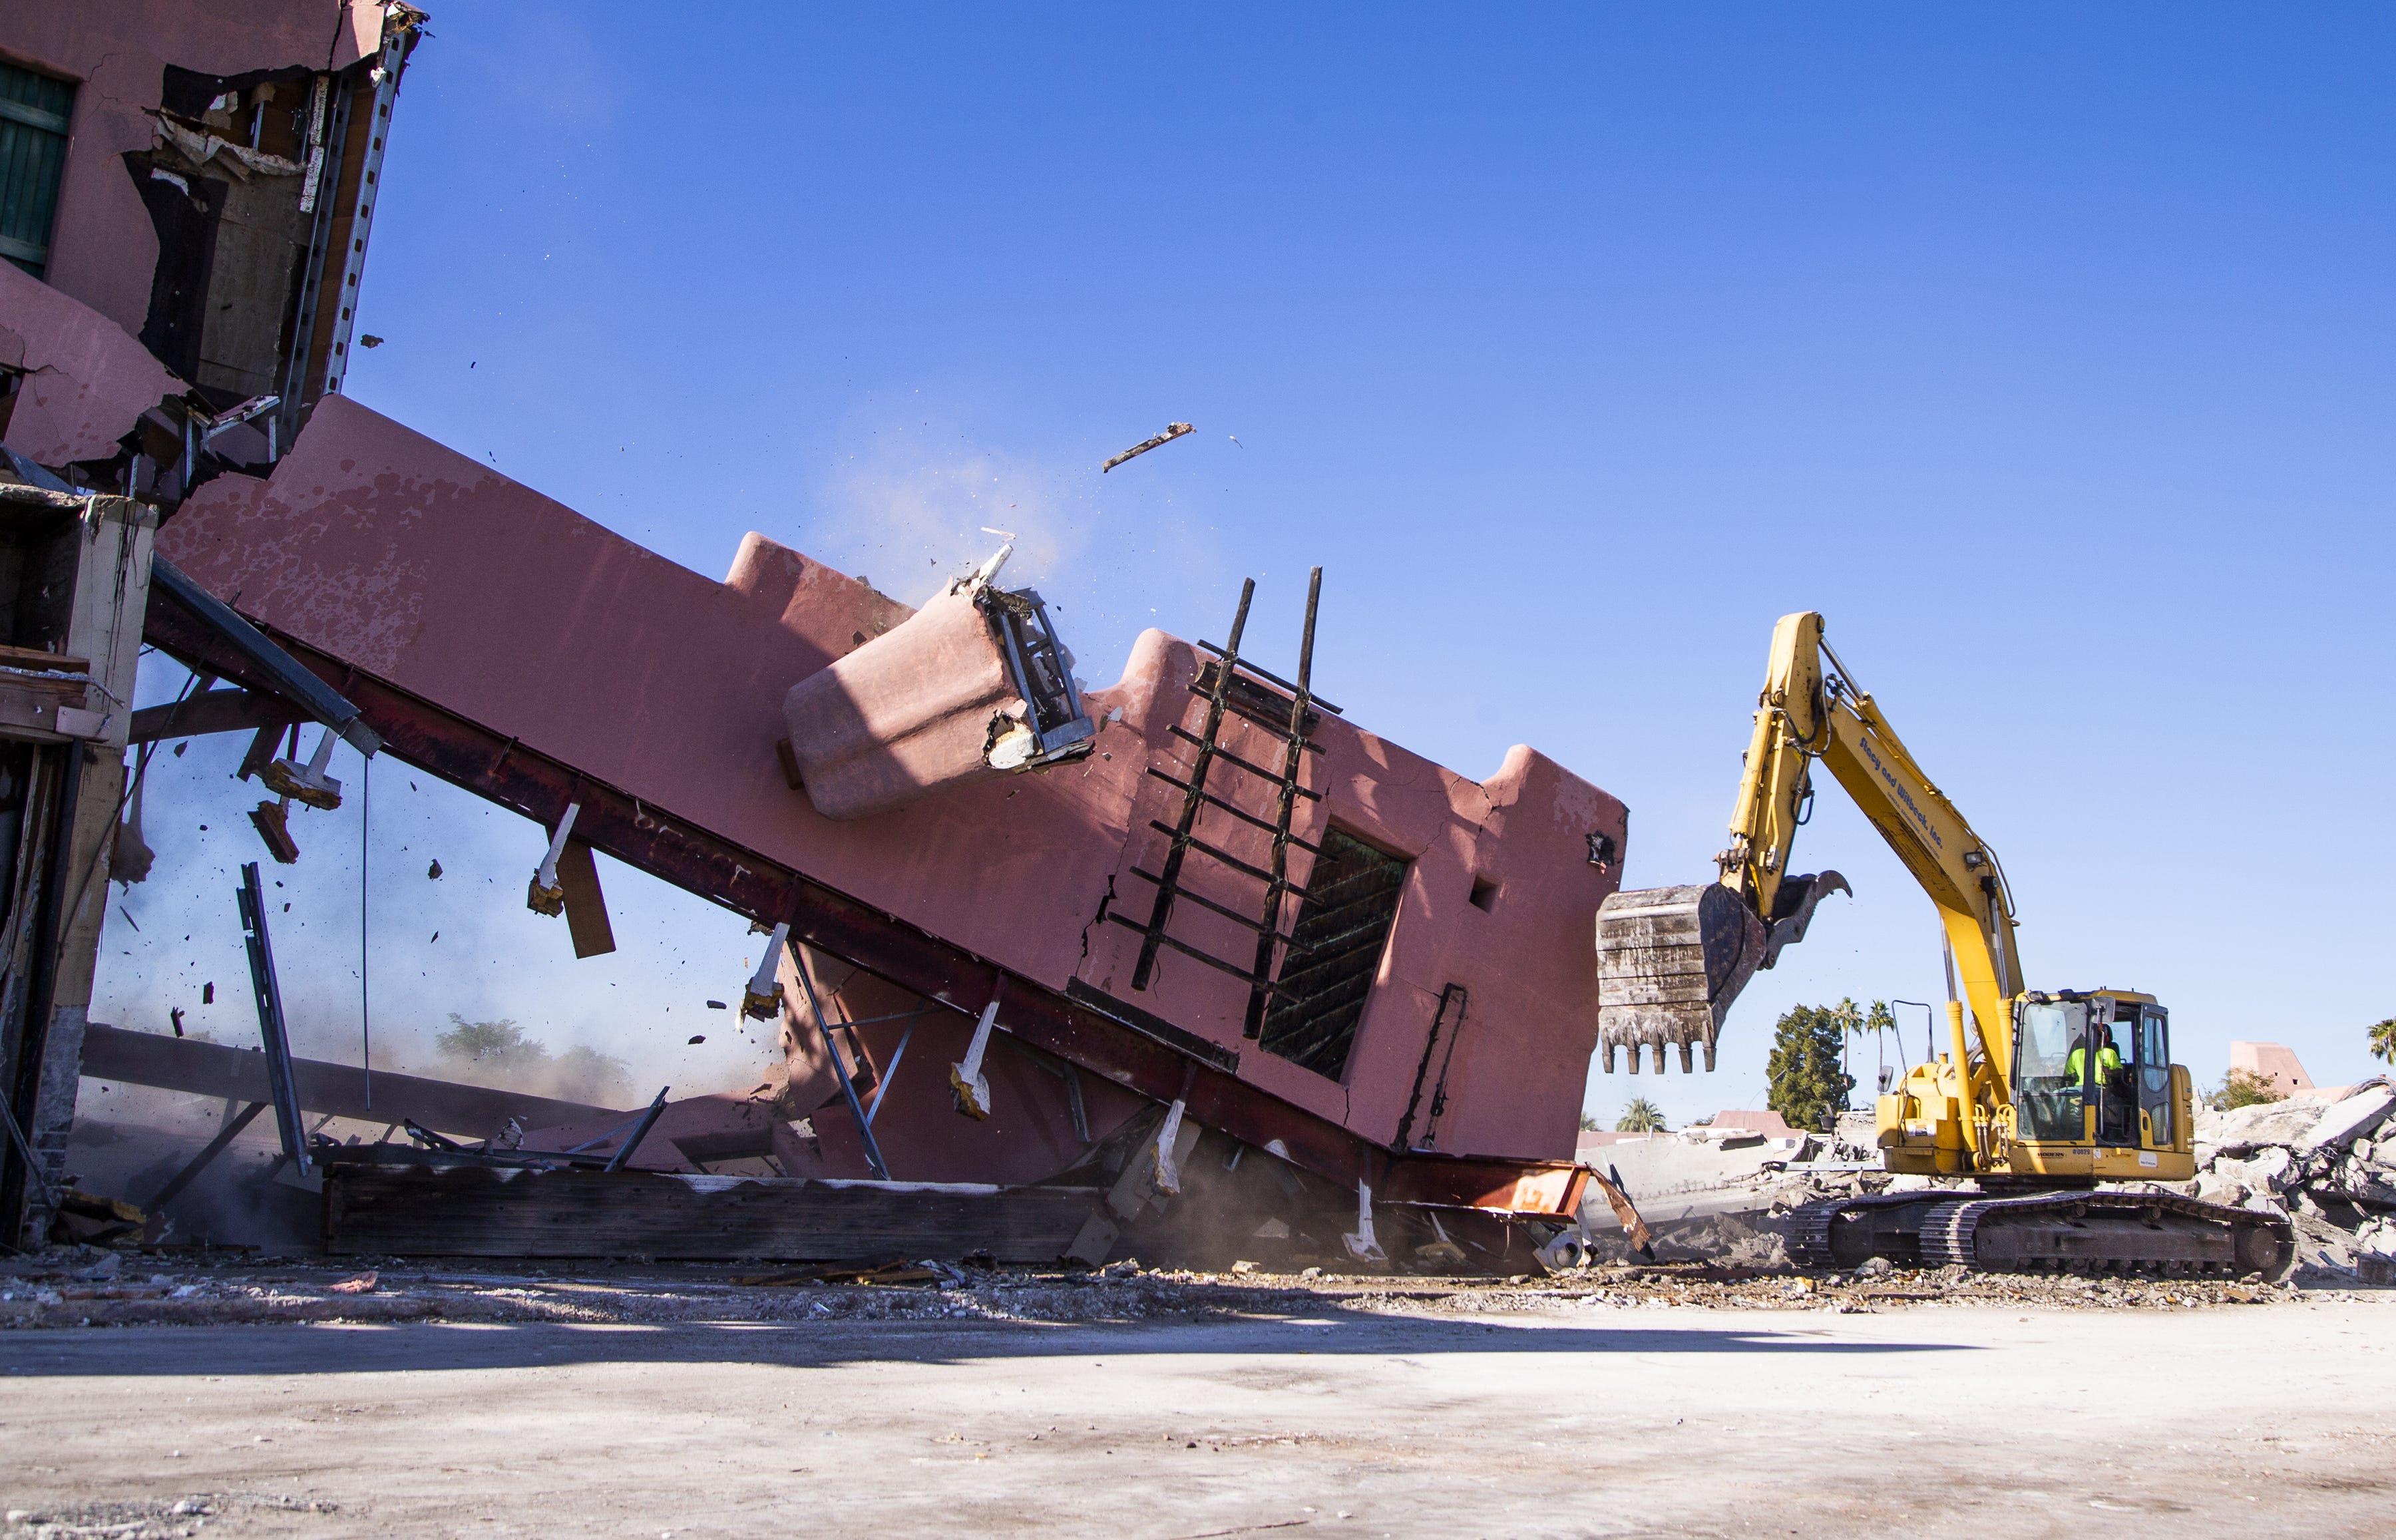 Scottsdale's Papago Plaza demolition